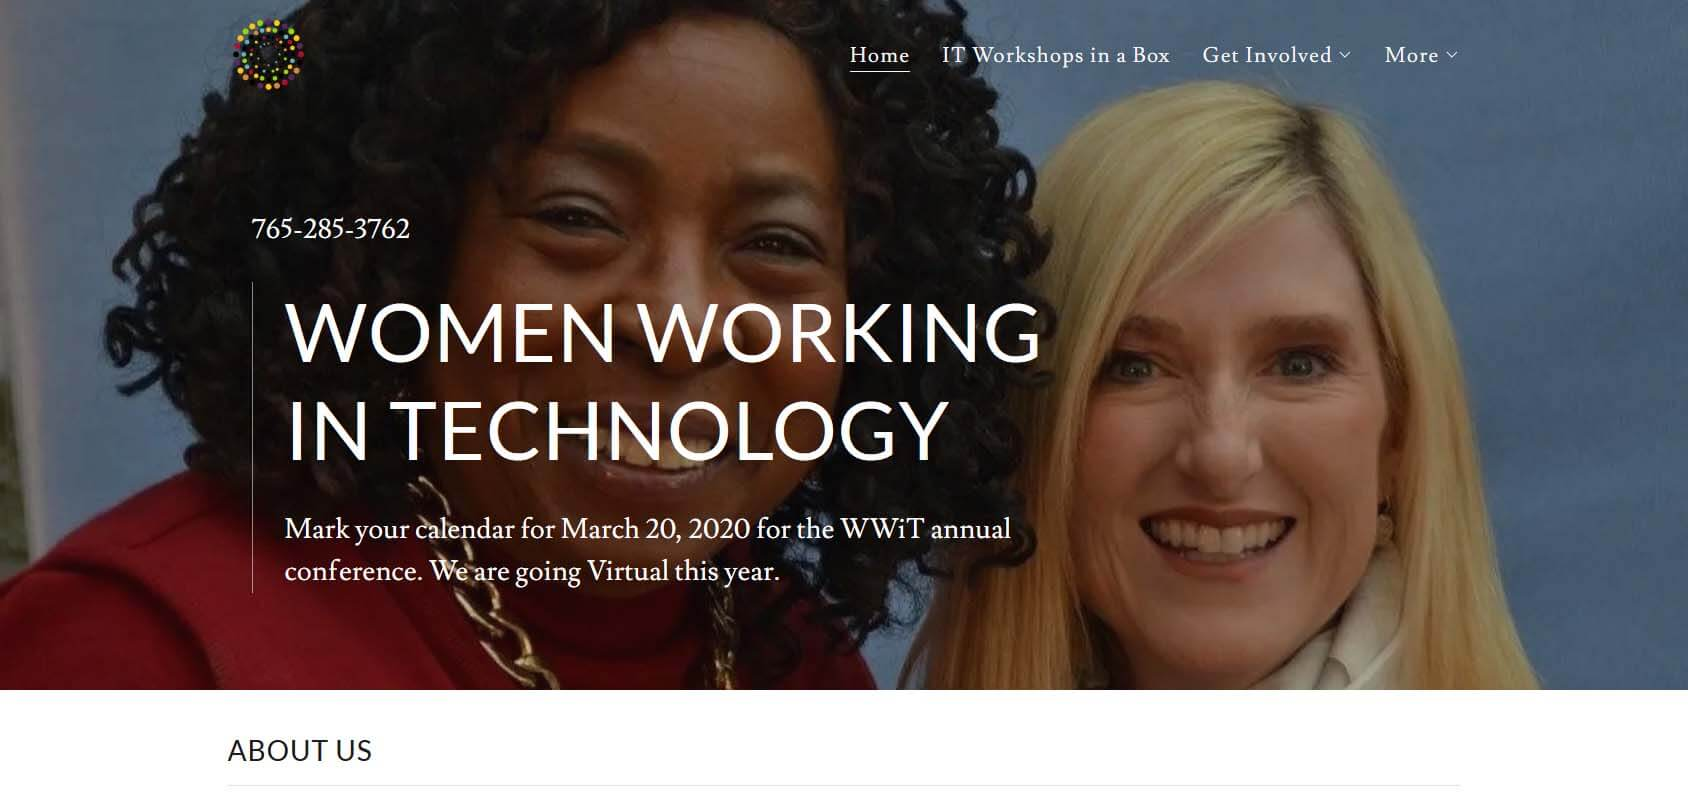 Women Working in Technology Homepage